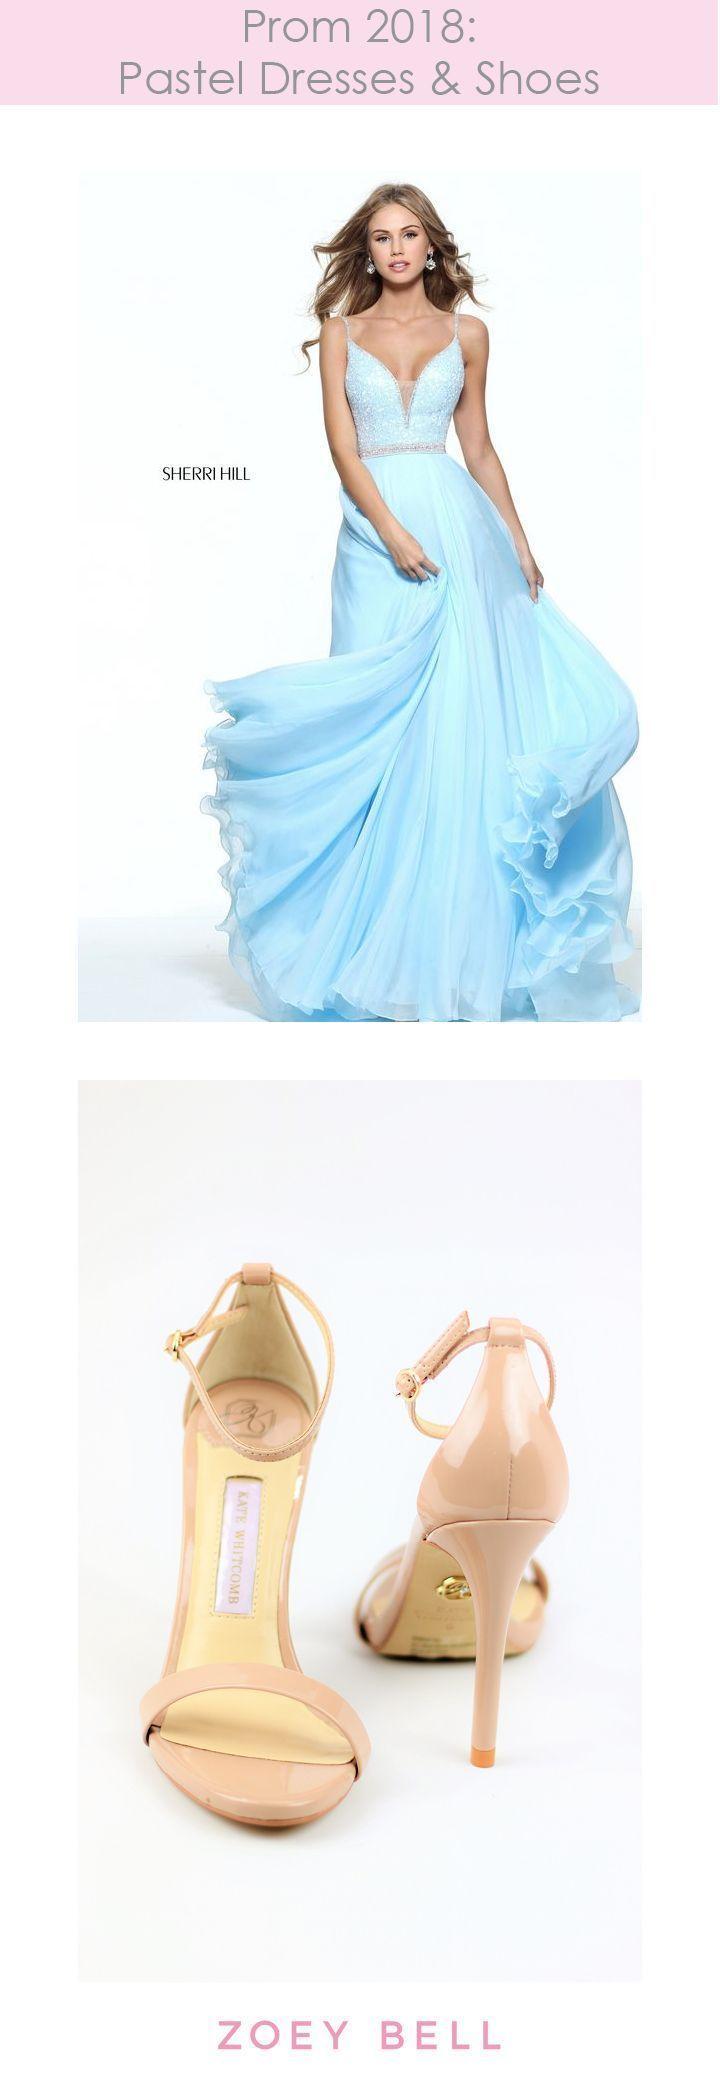 Prom prom shoes prom heel prom flats flats flat shoes